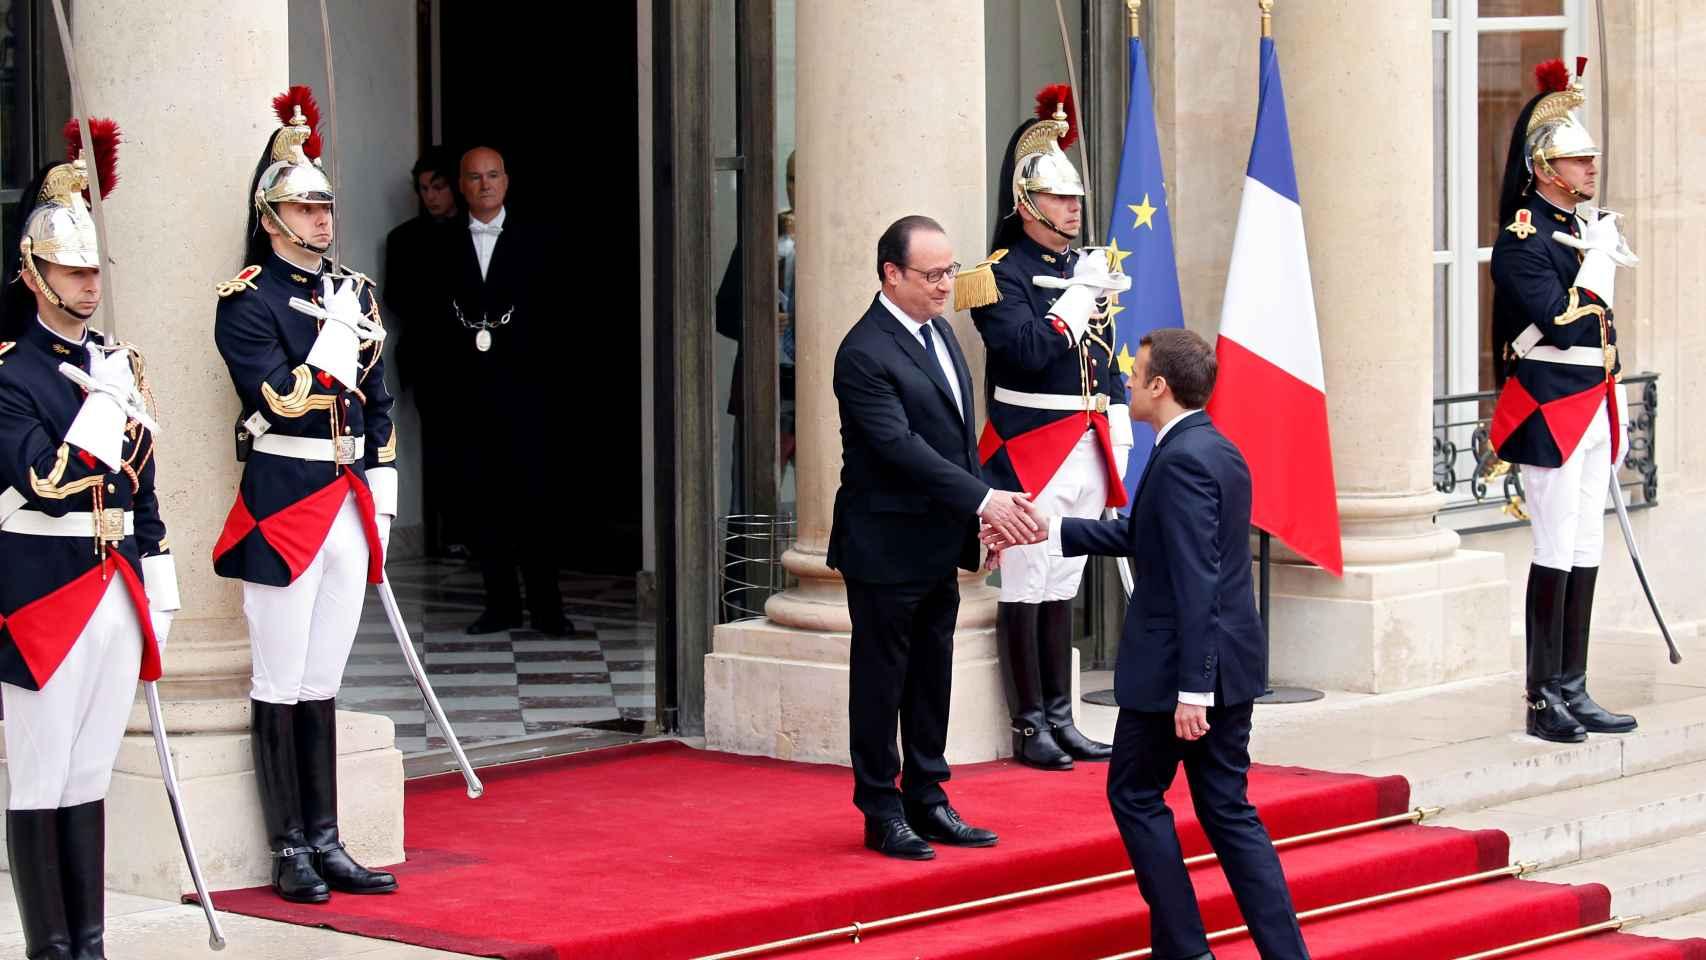 La toma de posesión de Macron